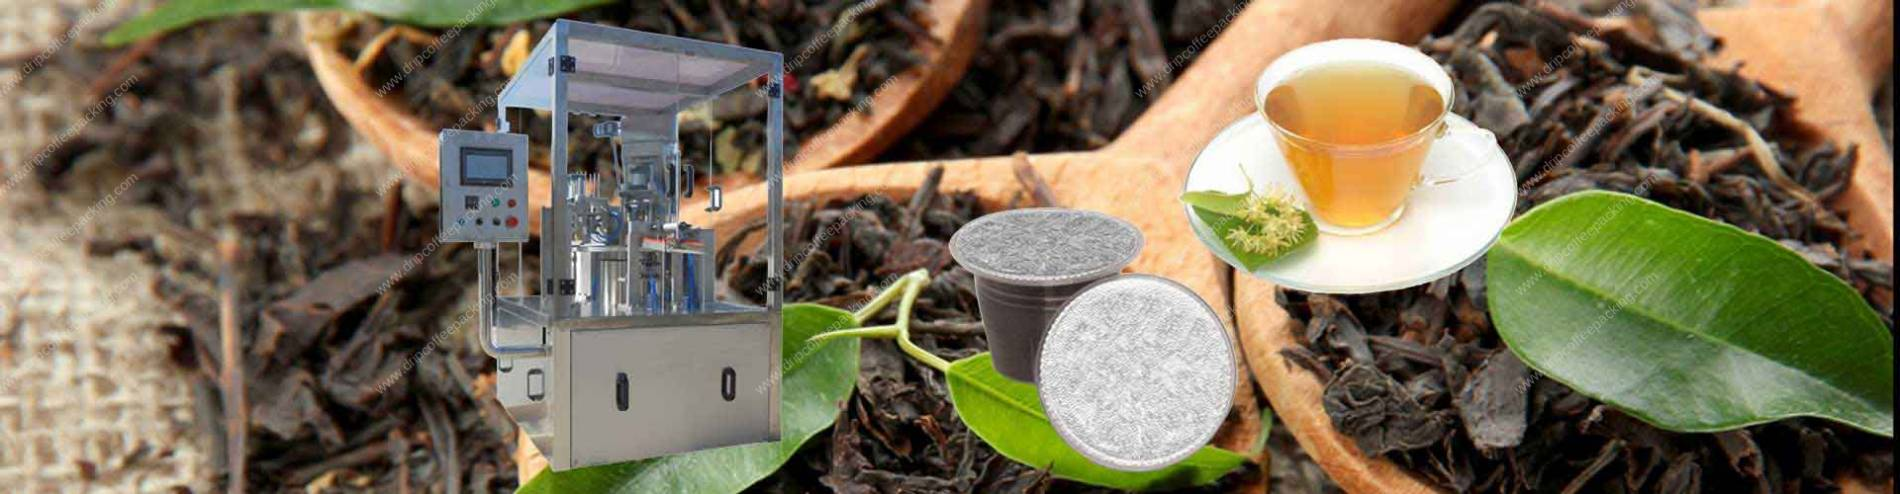 Banner4-English-Breakfast-Tea-Capsules-Filling-Sealing-Machine